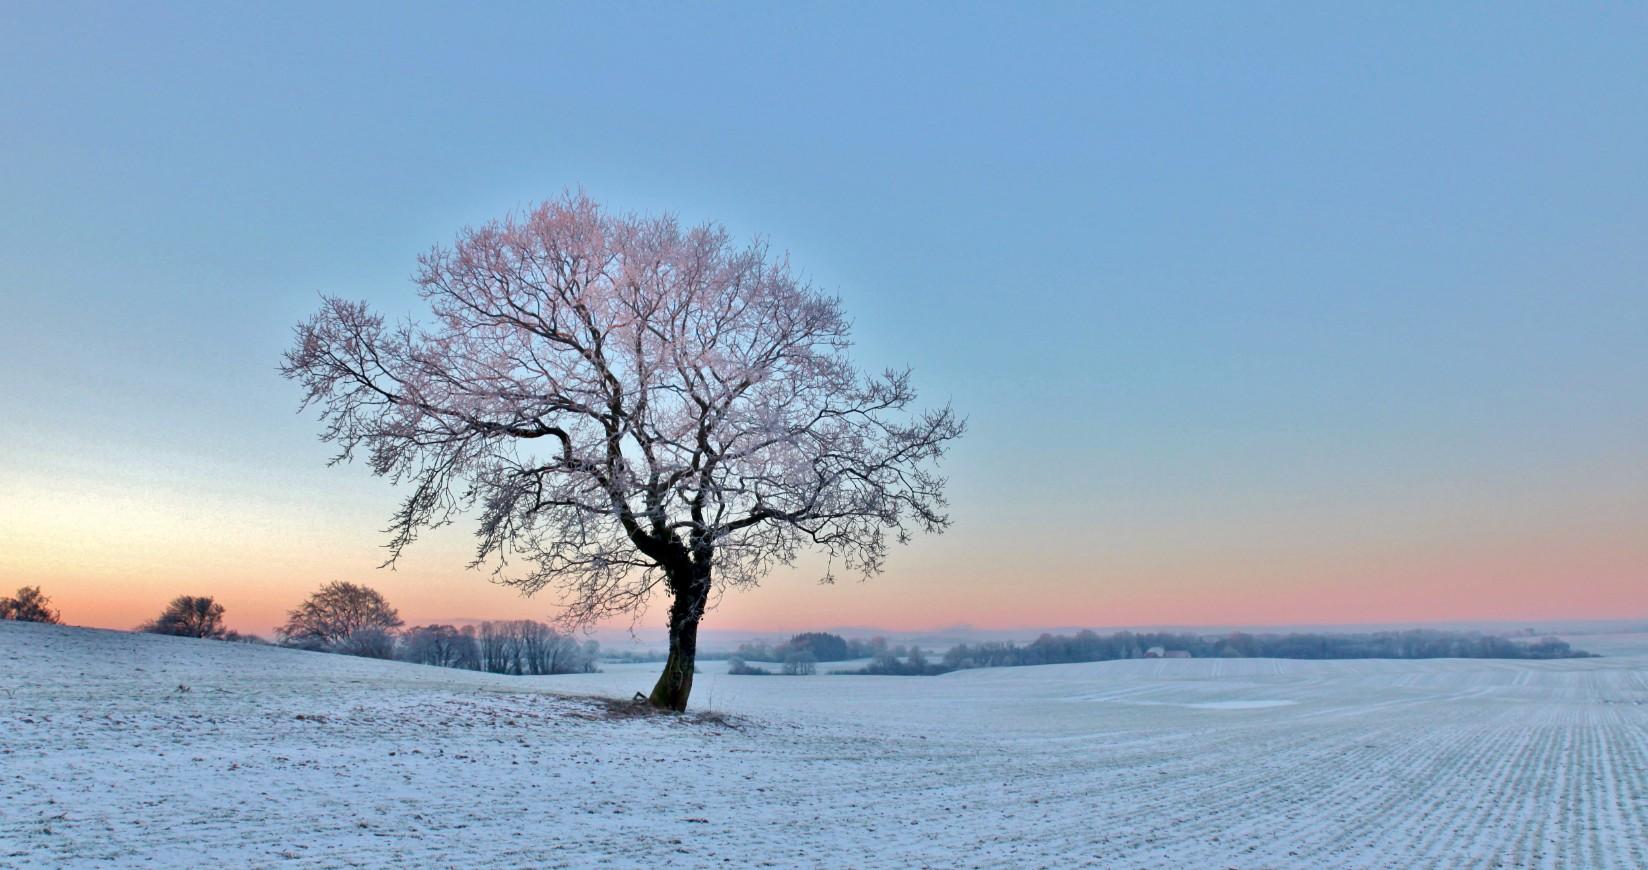 Viggo Hjort Kohberg - Det enesomme træ i skumringen på en mark Over Kestrup